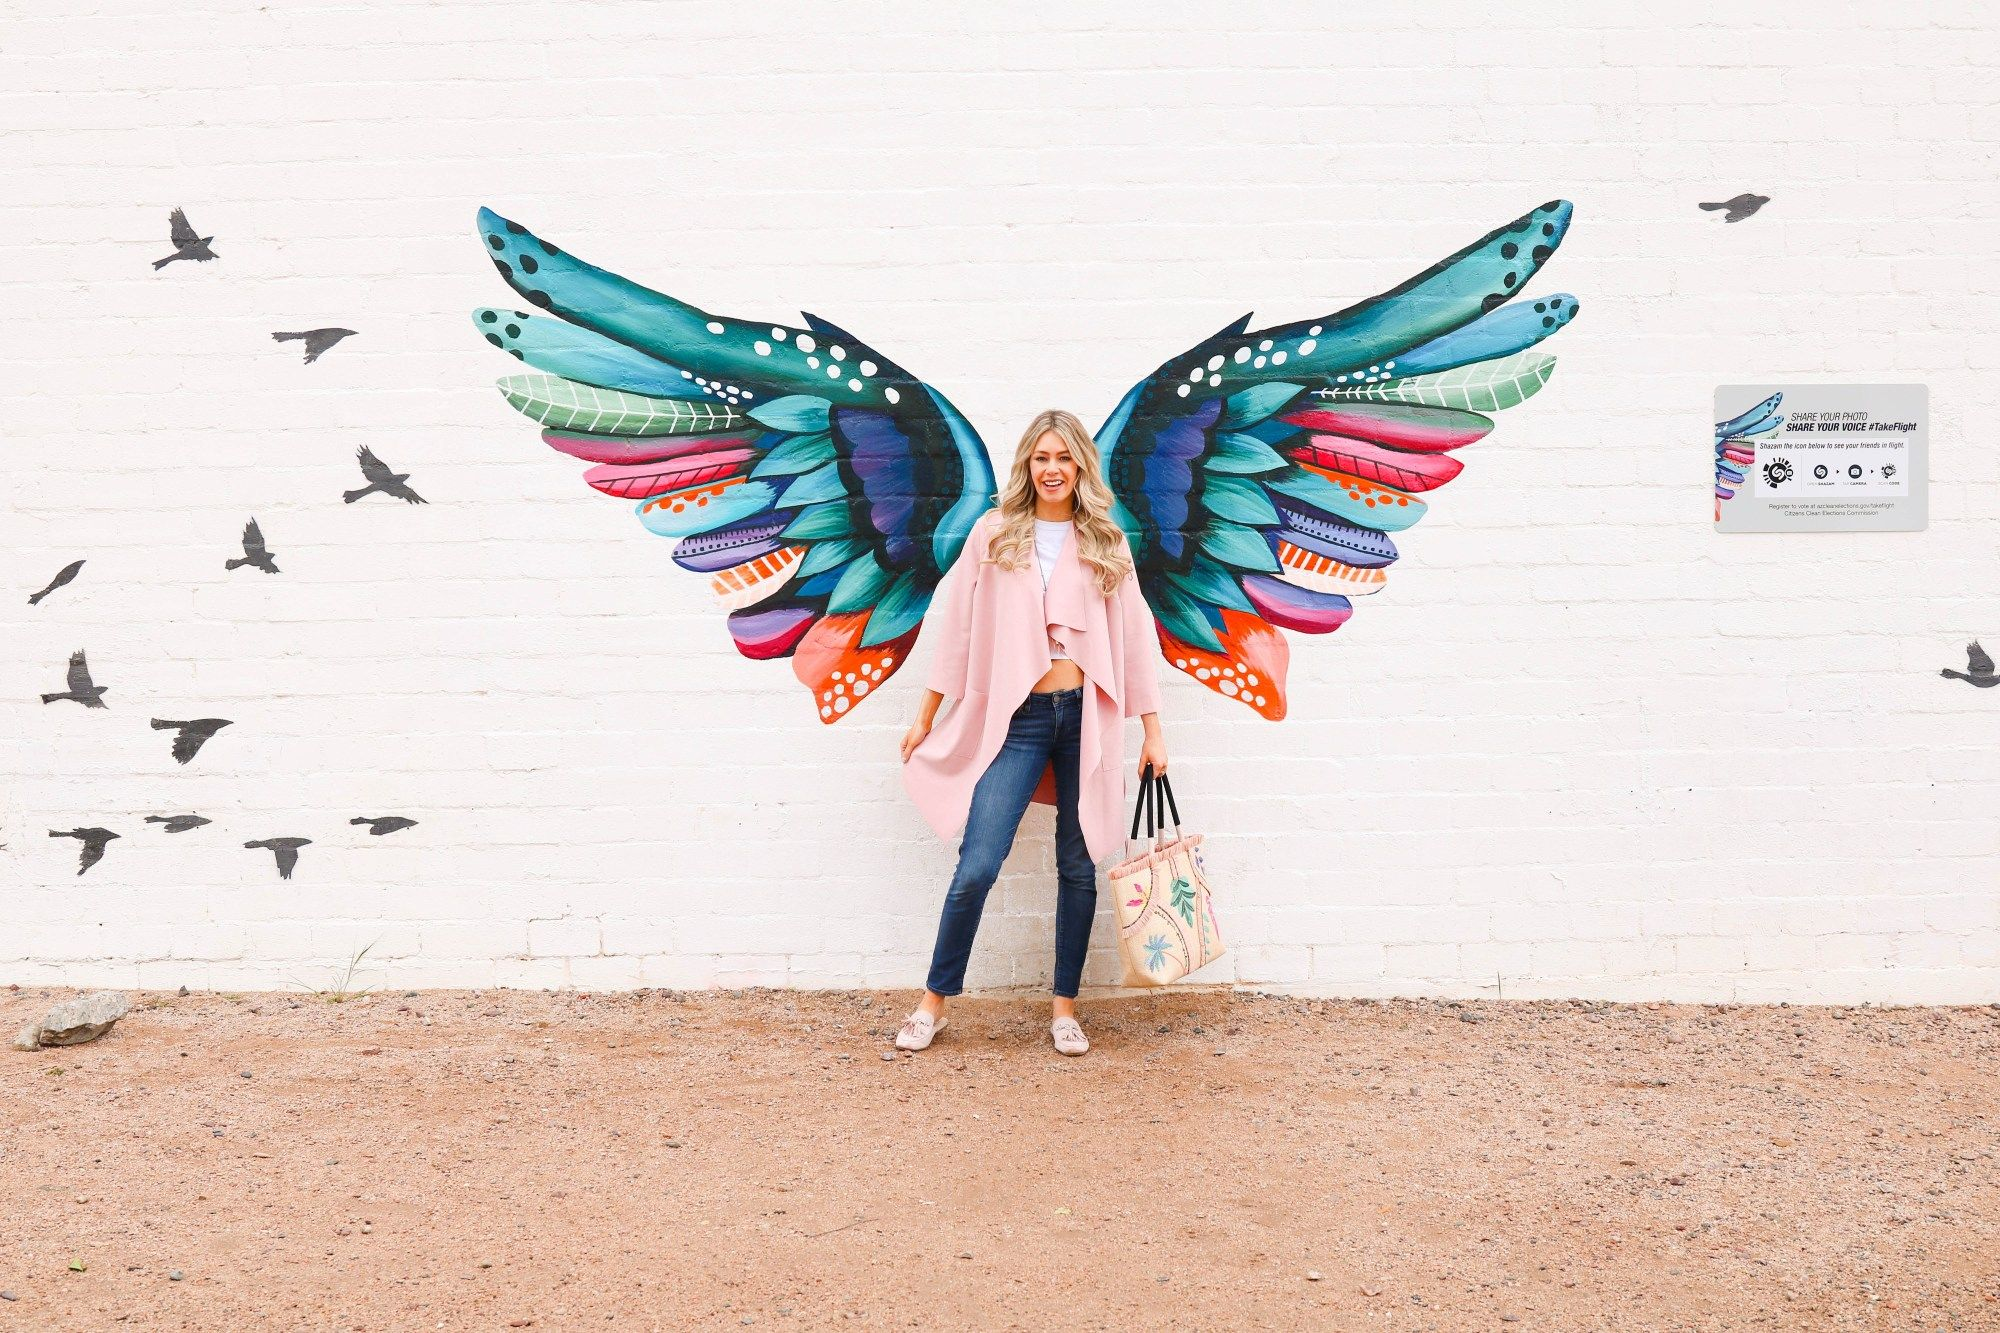 Instagrammable Walls In Phoenix And Mesa Arizona Pursuing Pretty Graffiti Wall Art Instagram Wall Mural Art